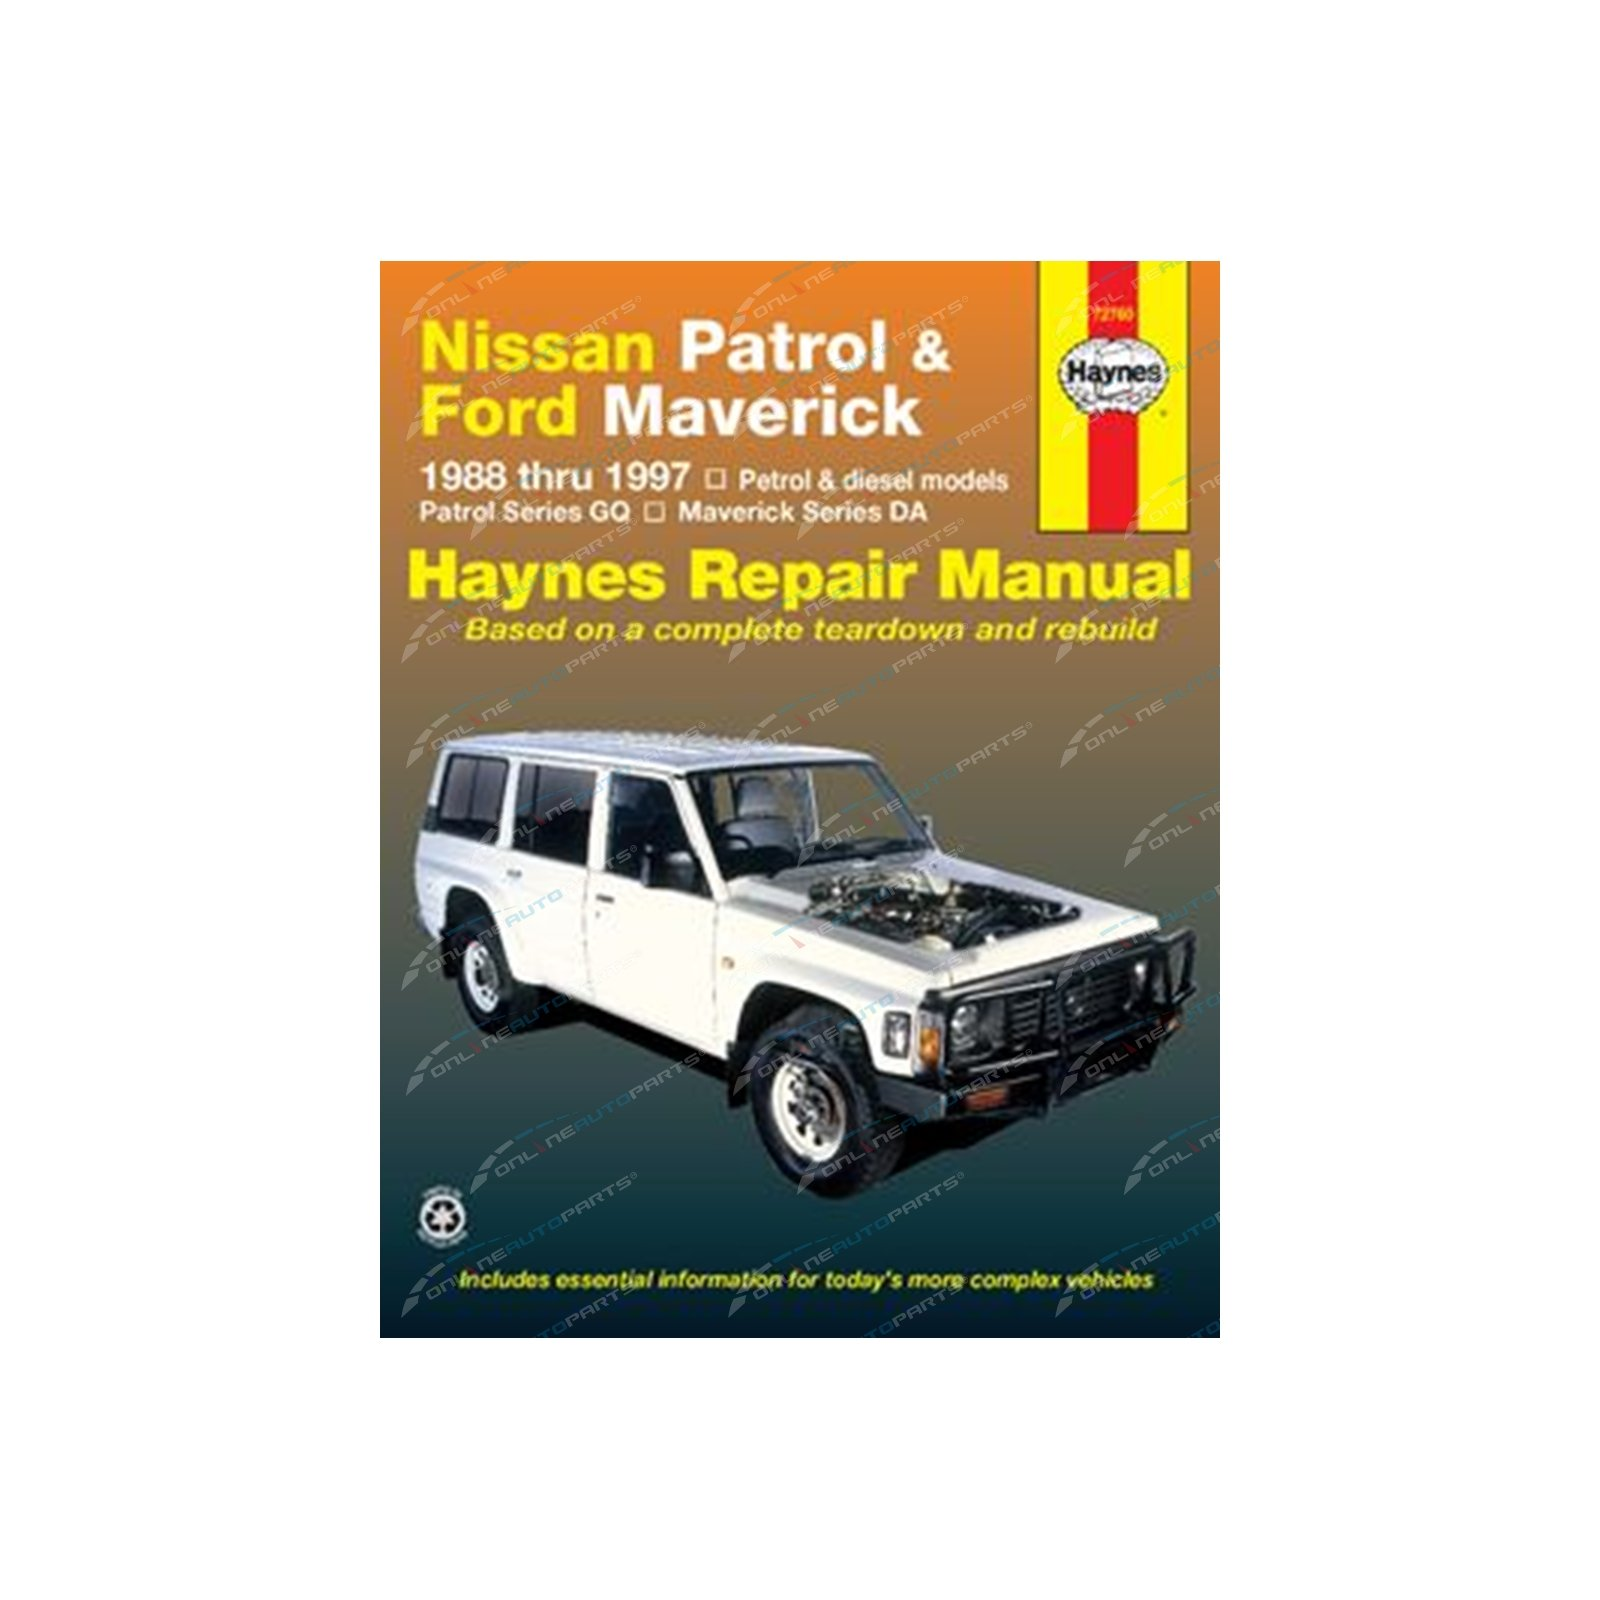 automotive repair manuals haynes repair manuals book cracked